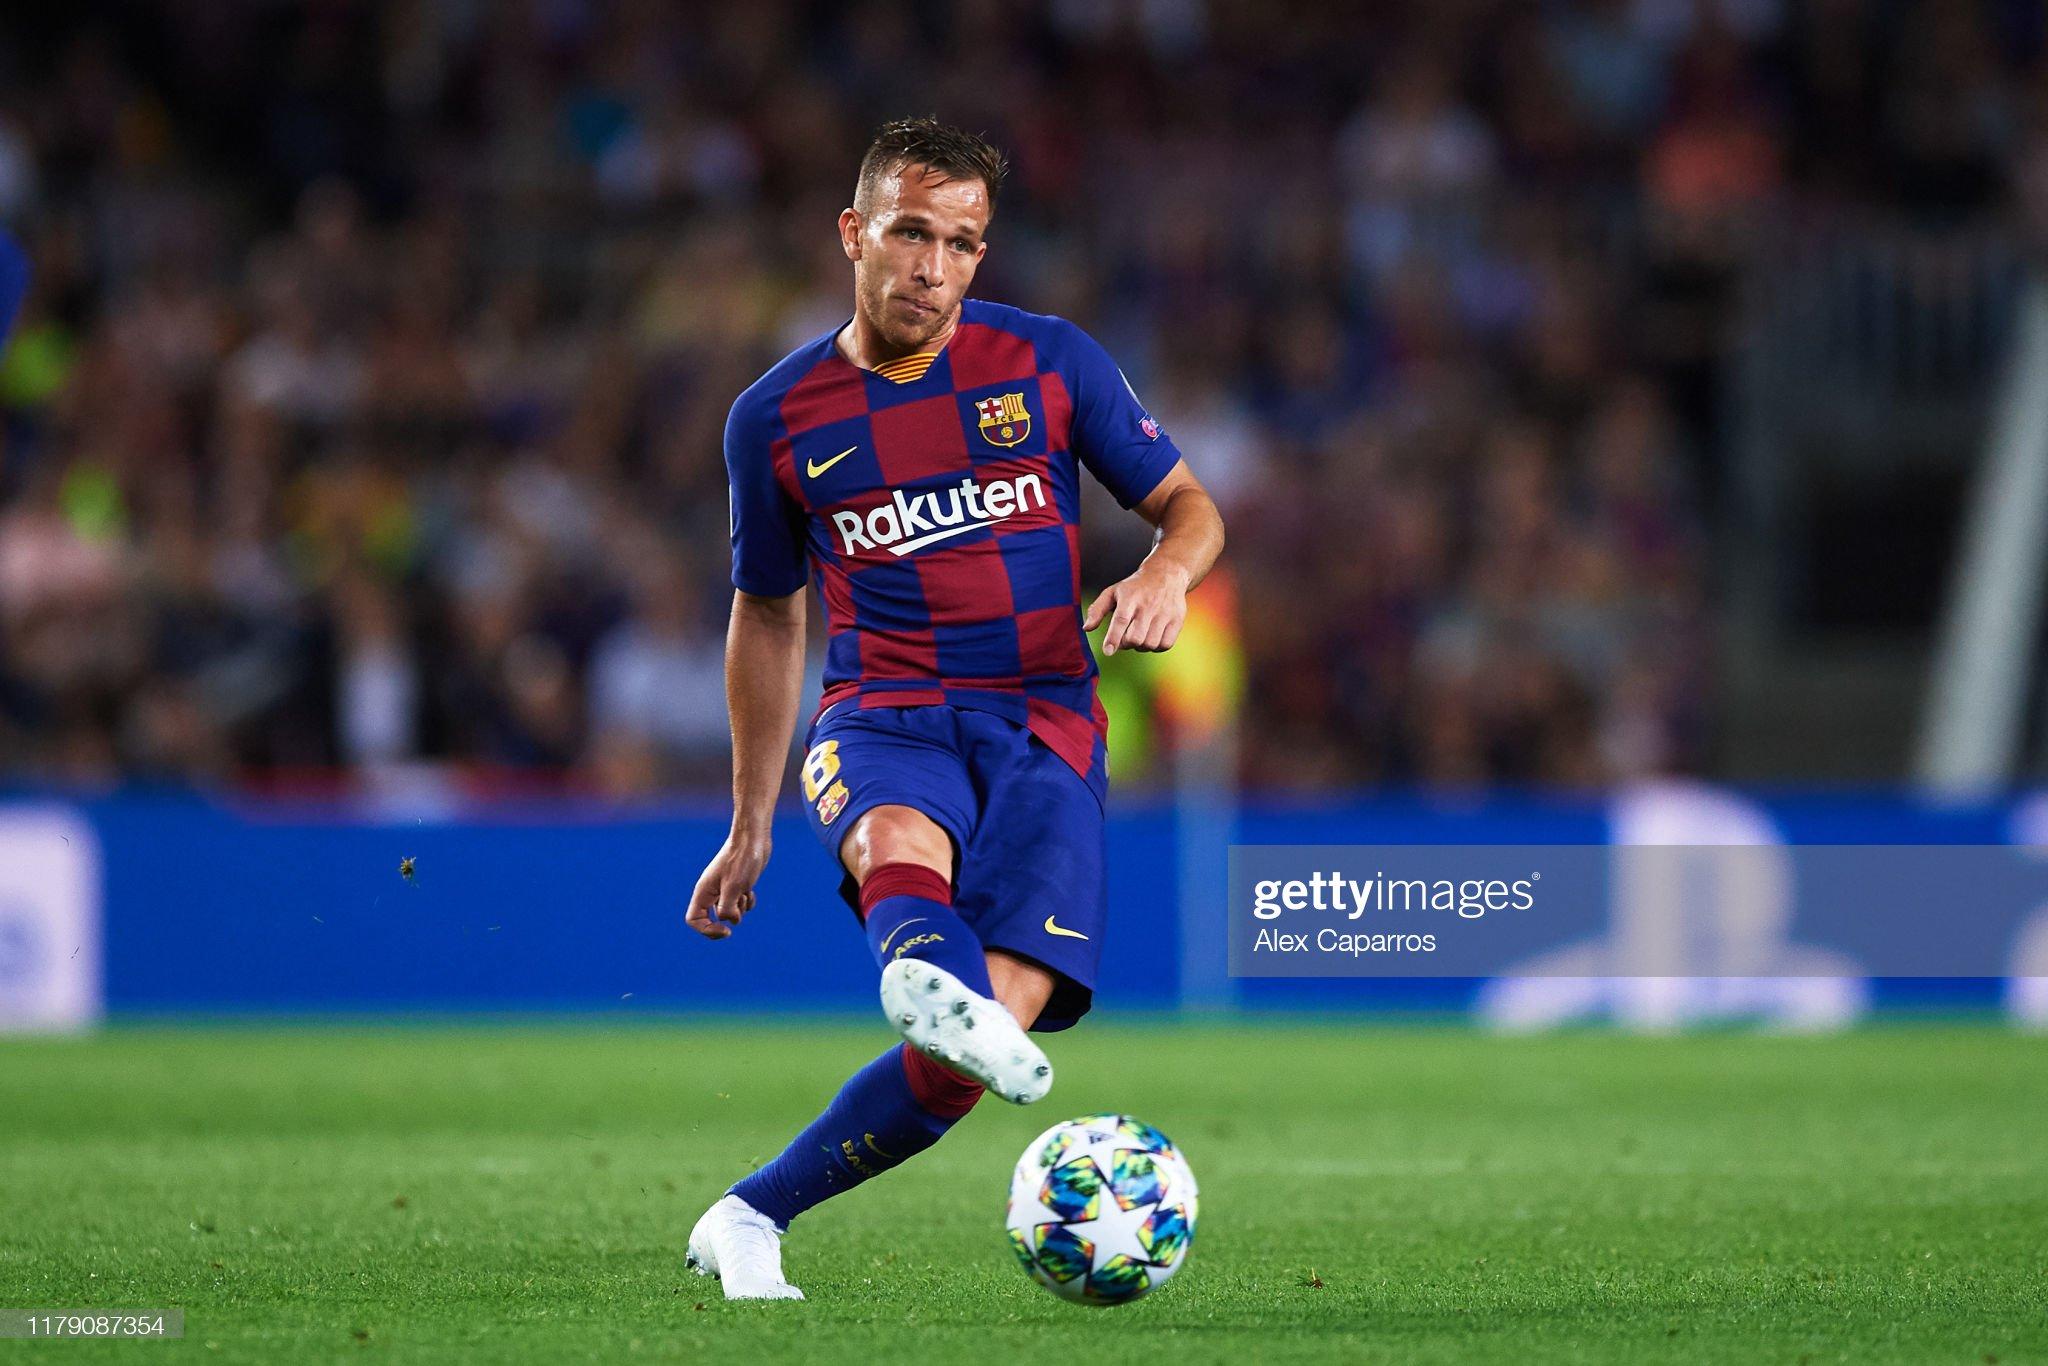 صور مباراة : برشلونة - إنتر 2-1 ( 02-10-2019 )  Arthur-melo-of-fc-barcelona-plays-the-ball-during-the-uefa-champions-picture-id1179087354?s=2048x2048